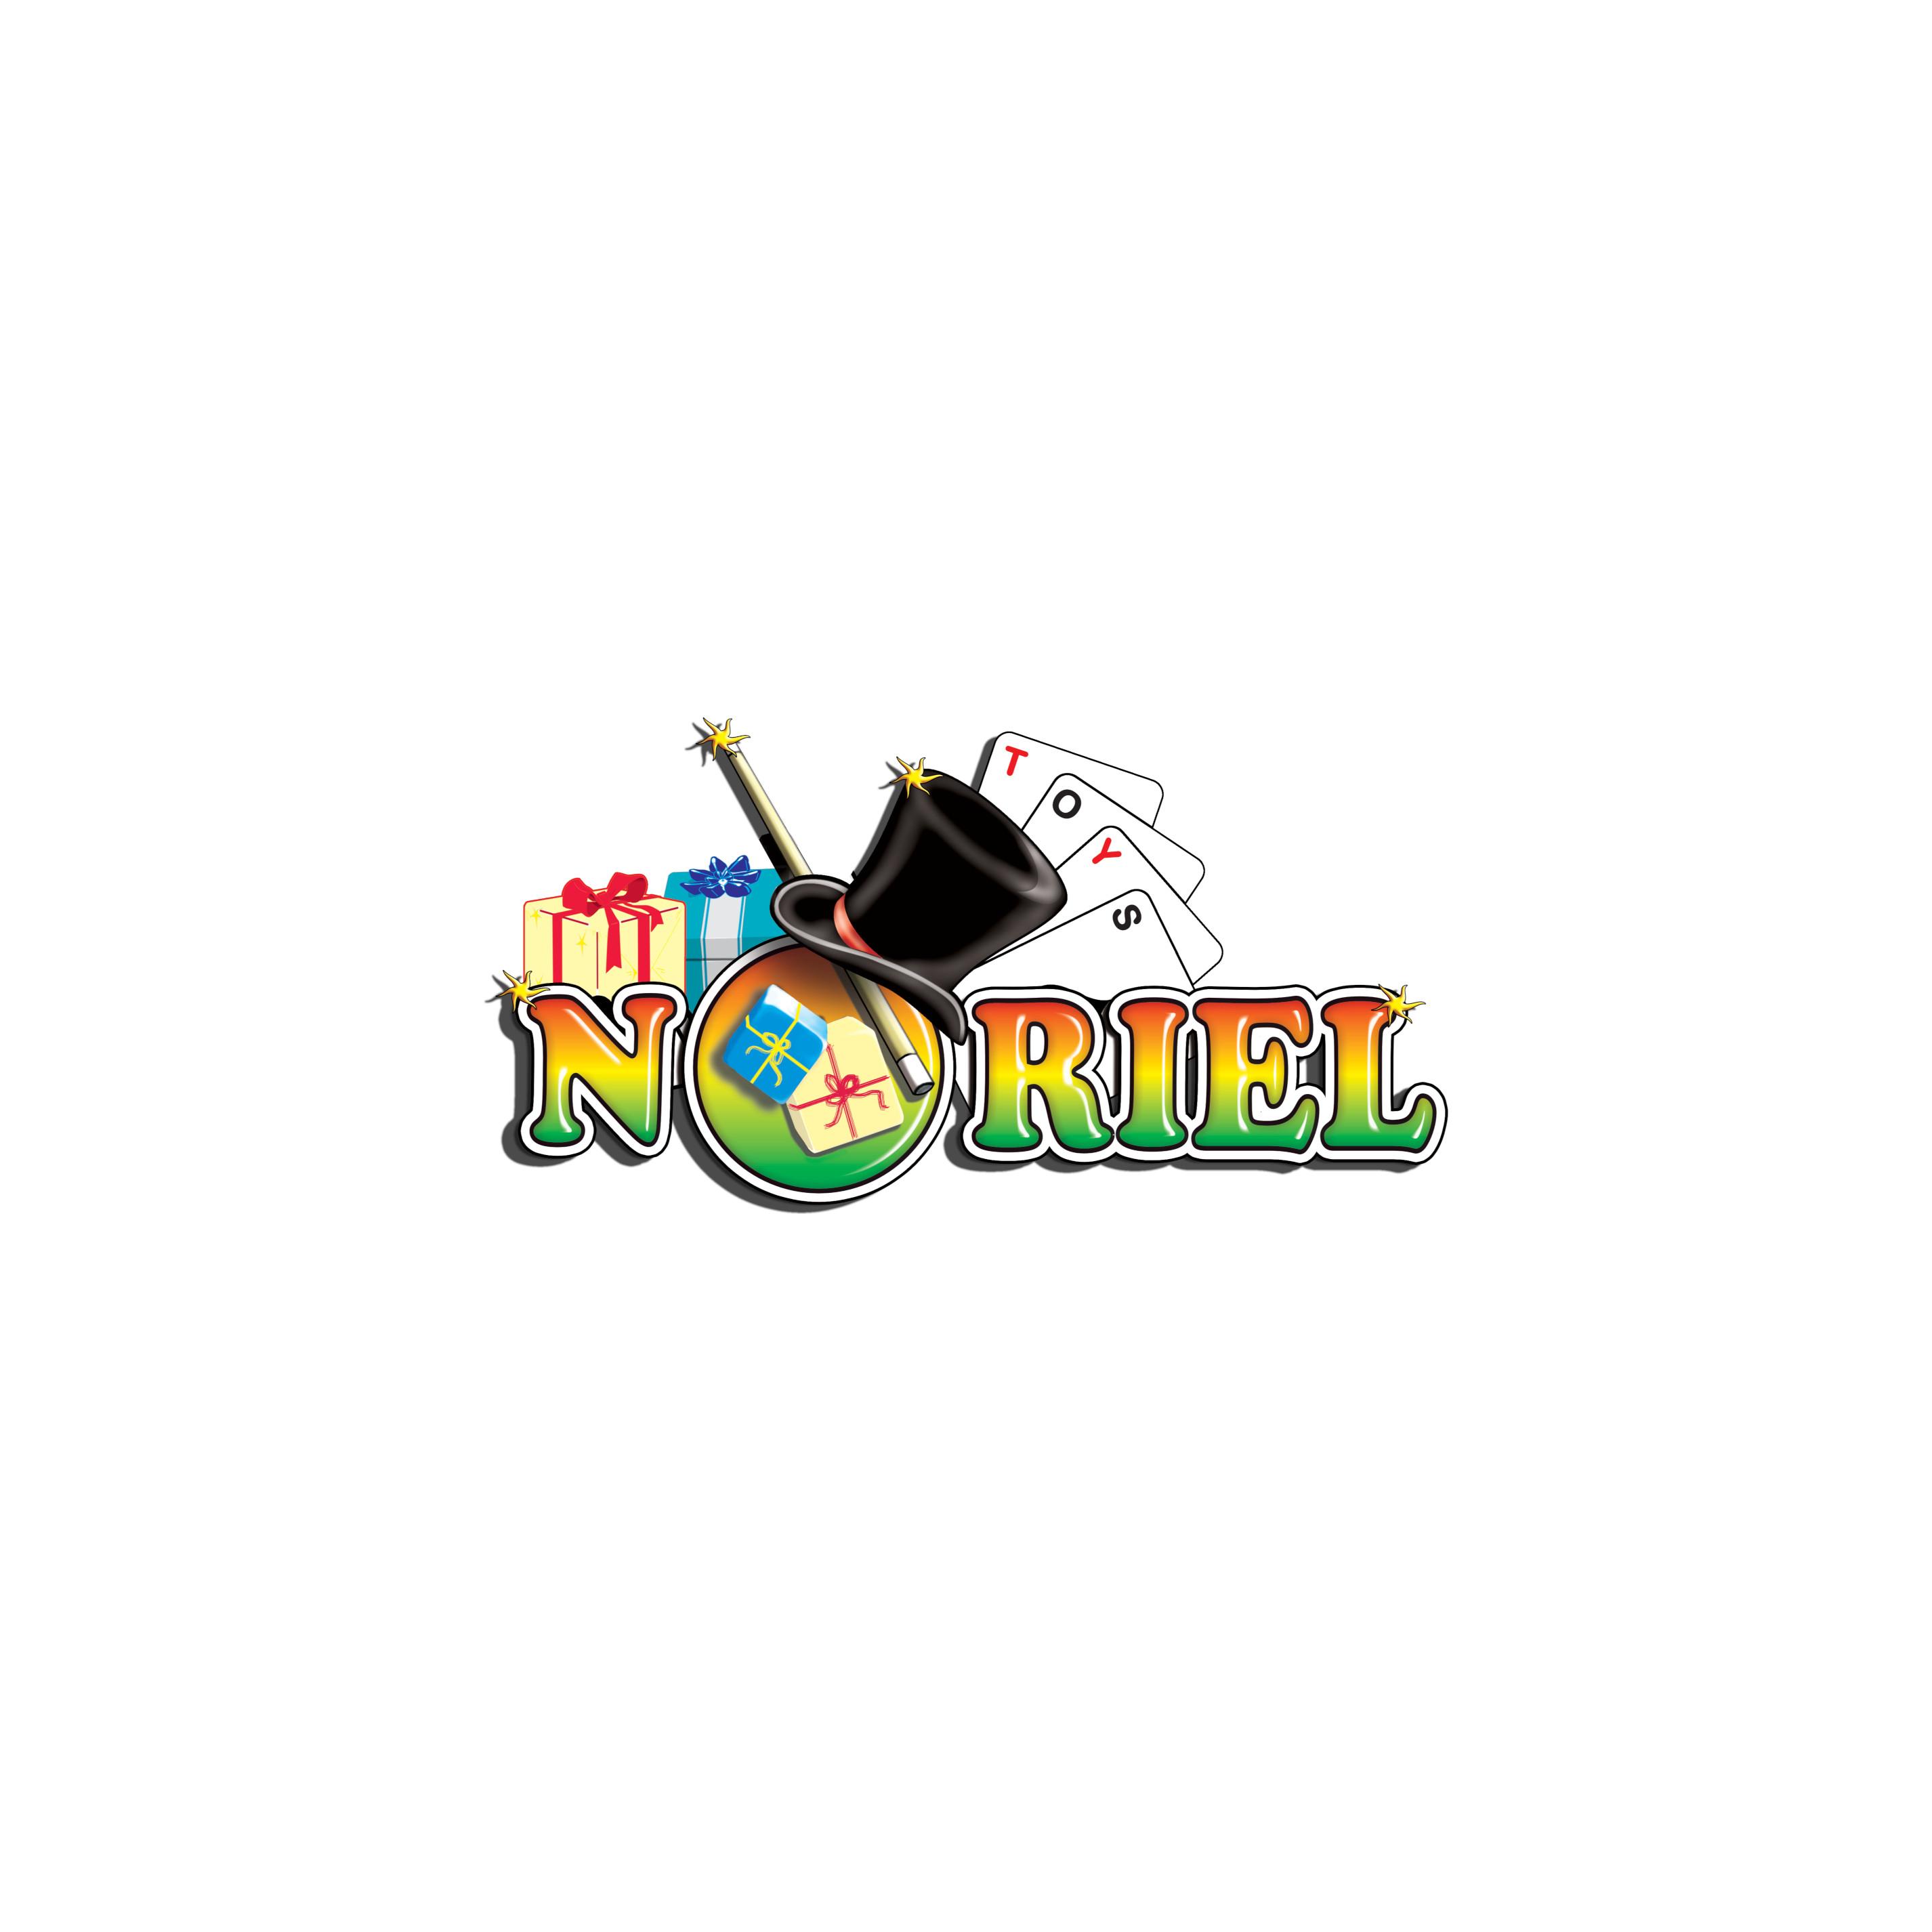 FRH28_2018_001w Set de joaca carusel cu masinuta Hot Wheels City, FRH30